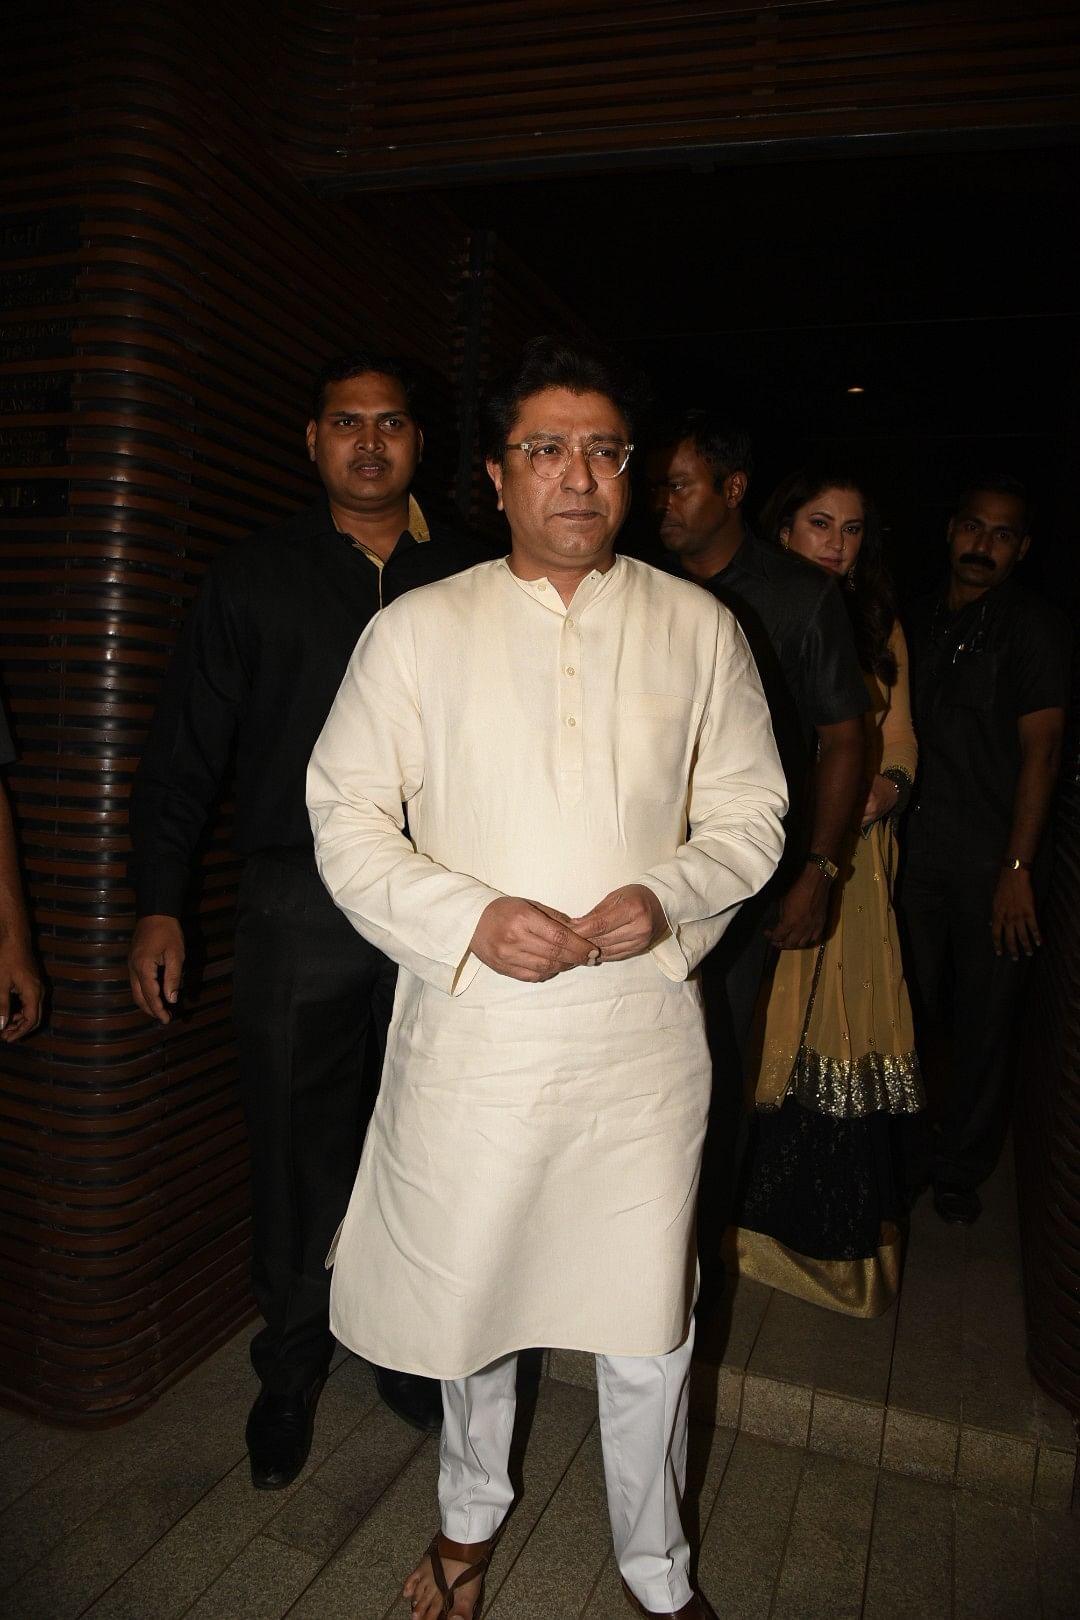 Raj Thackeray makes an appearance in all white. (Photo: Yogen Shah)